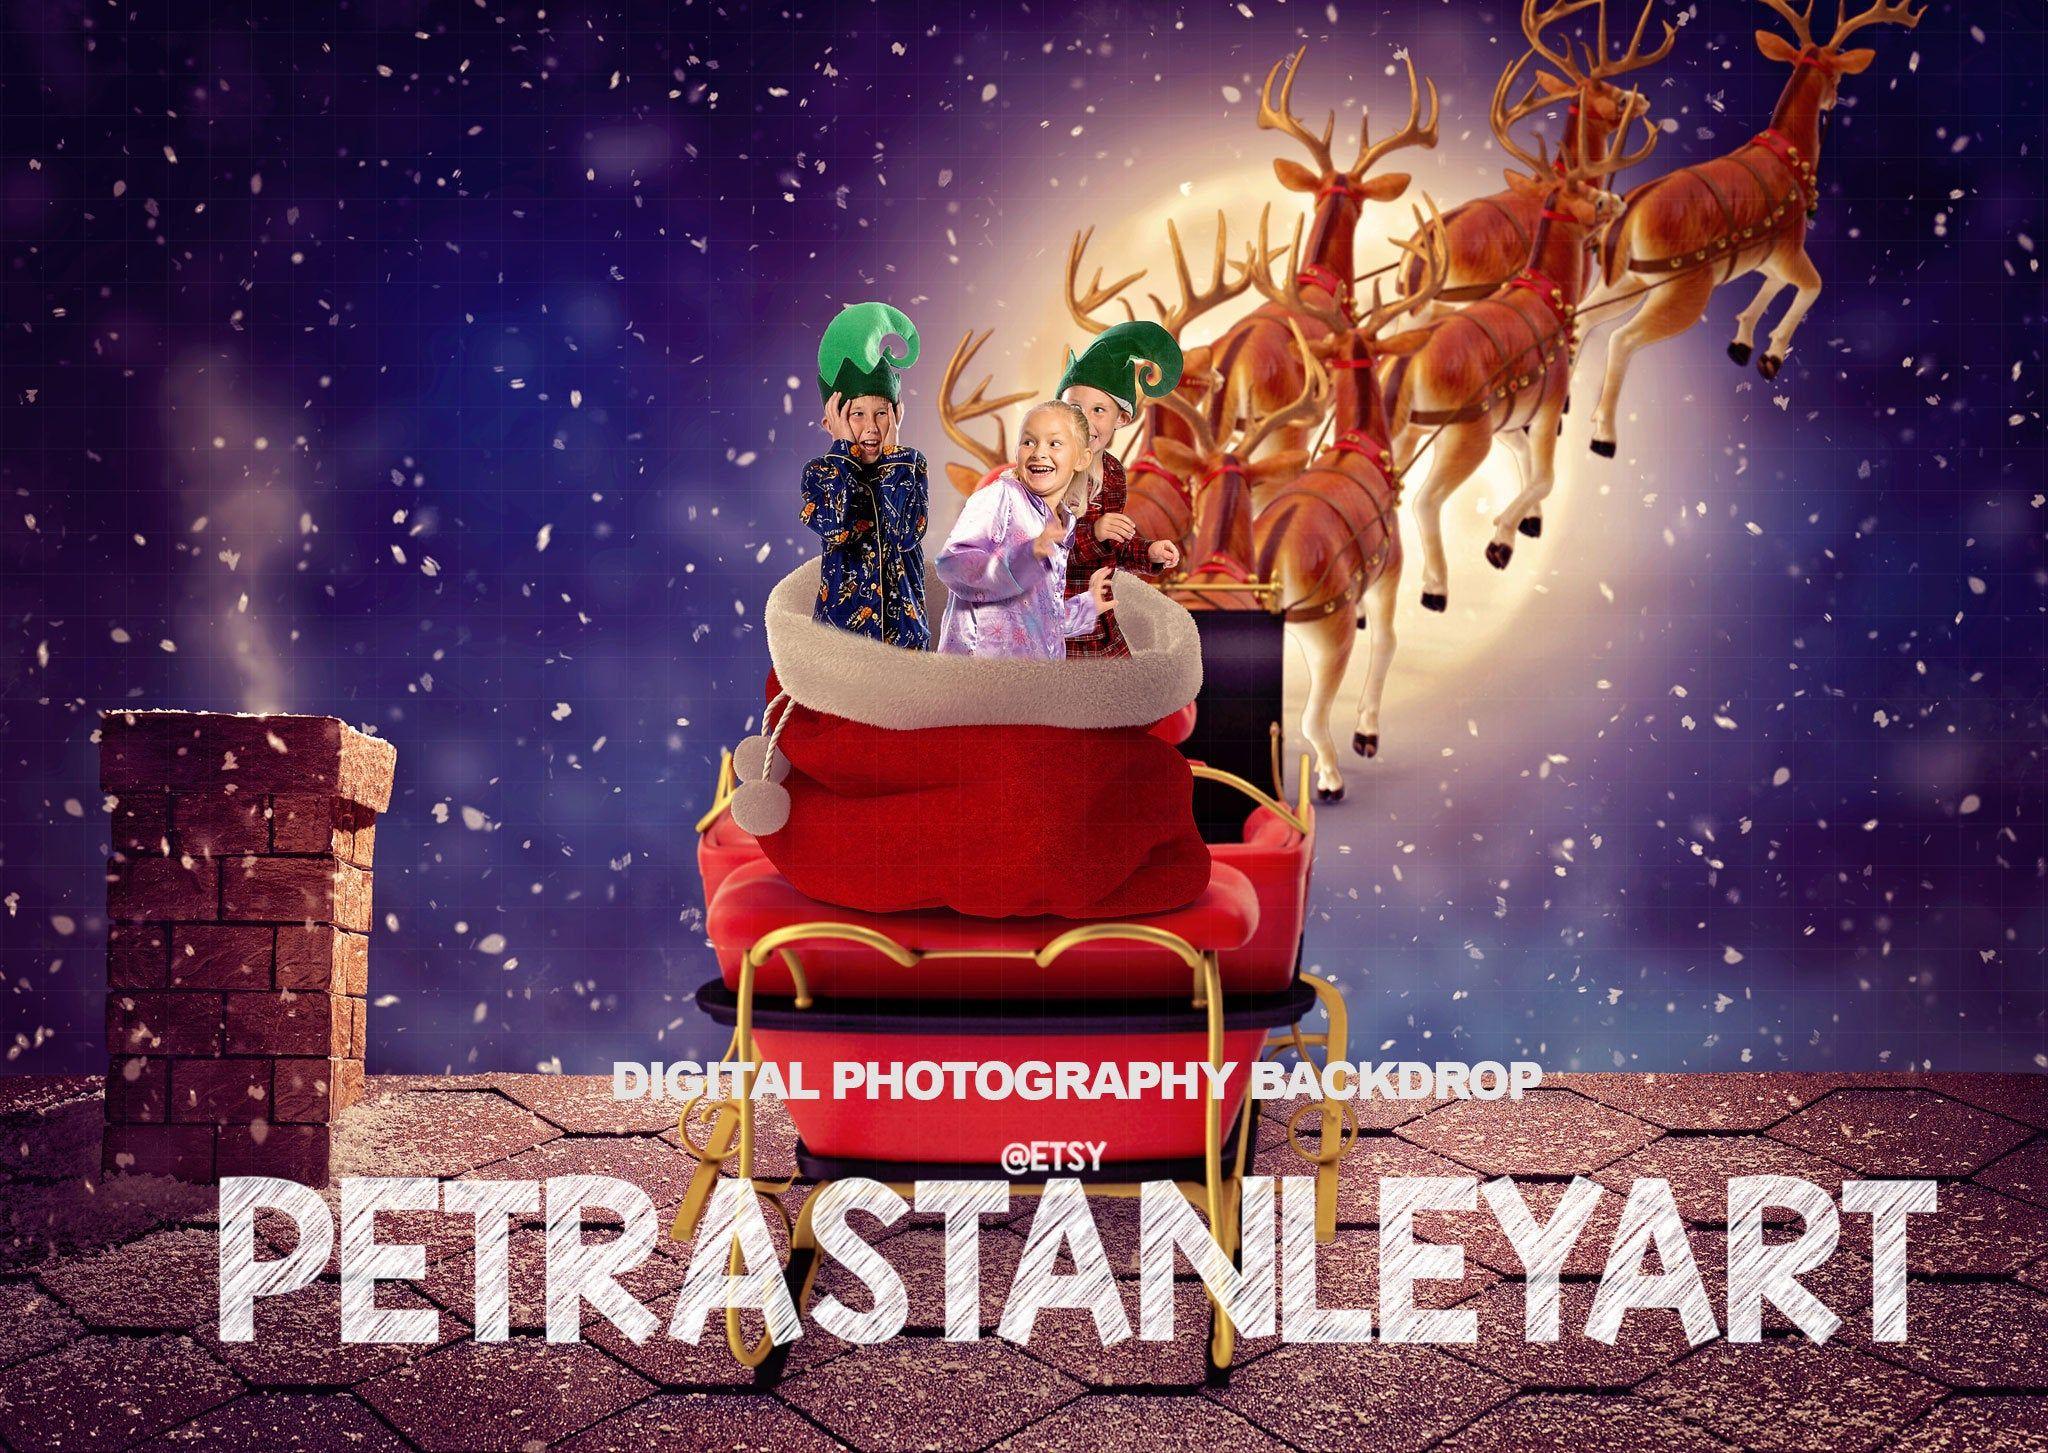 Santa's Sleigh on Christmas Roof Digital Backdrop, Winter Background for Photography, Christmas Backdrop for Photographers, Digital Overlays #backdropsforphotographs